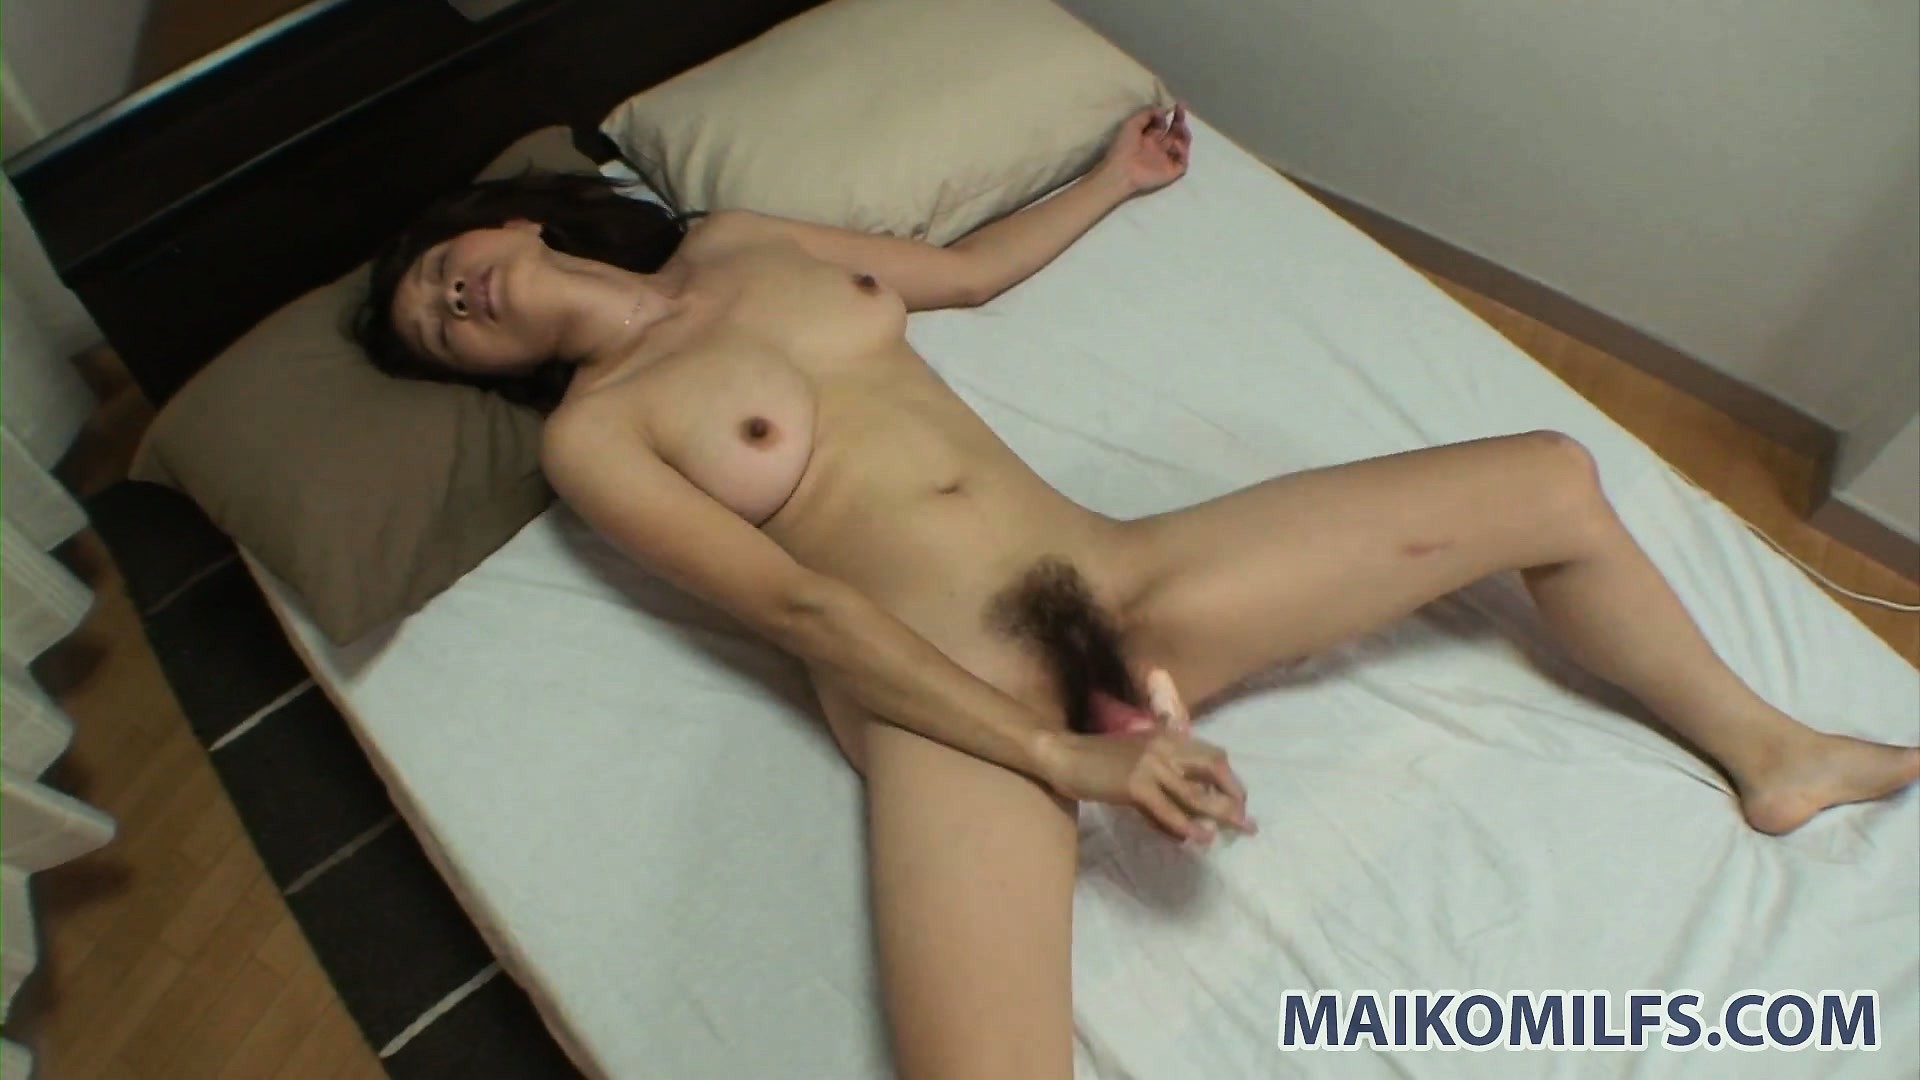 zrelaya-yaponka-masturbiruet